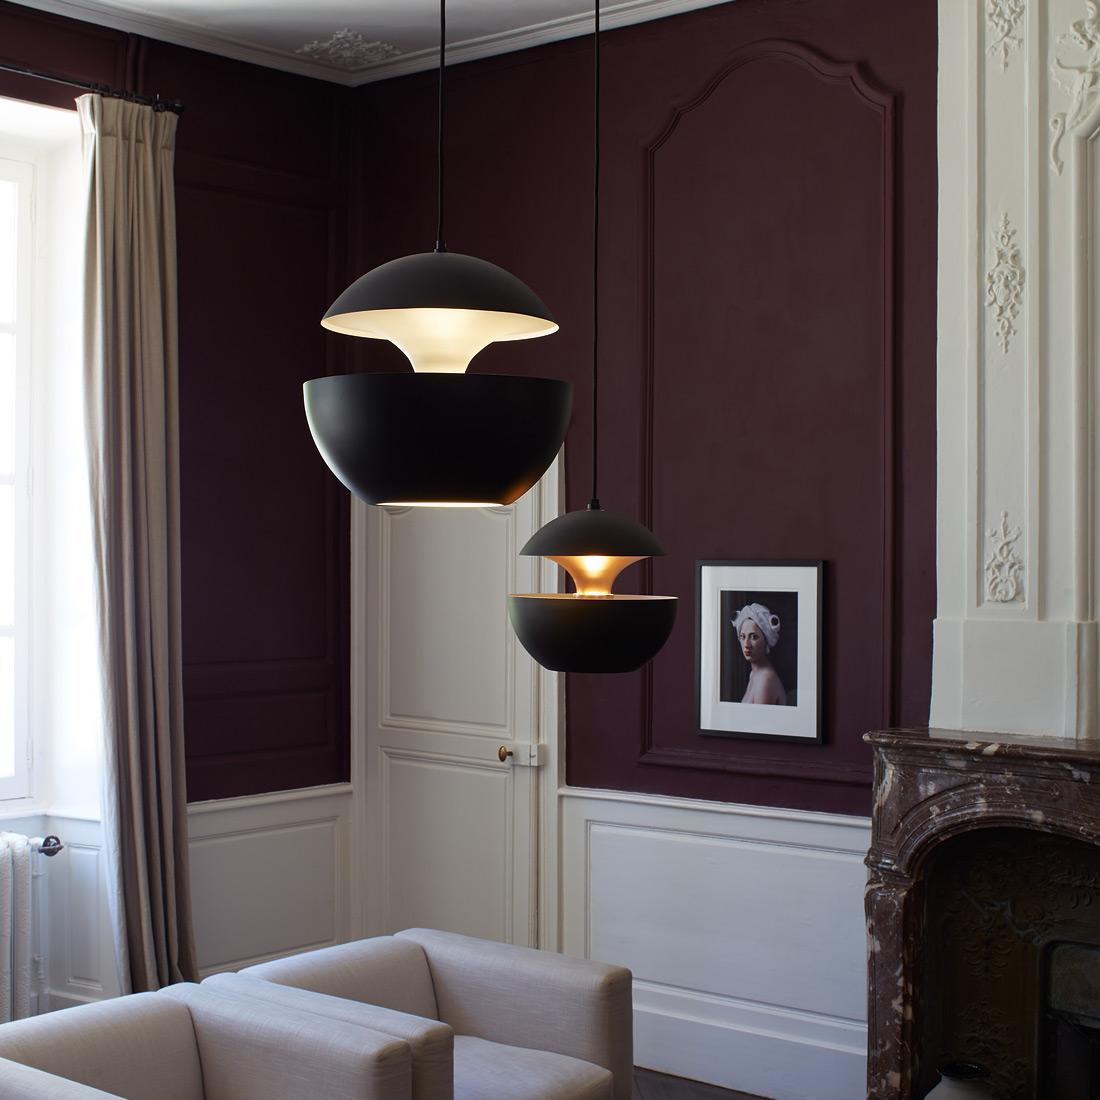 pendelleuchte im sixties design here comes the sun schwarz casa lumi. Black Bedroom Furniture Sets. Home Design Ideas